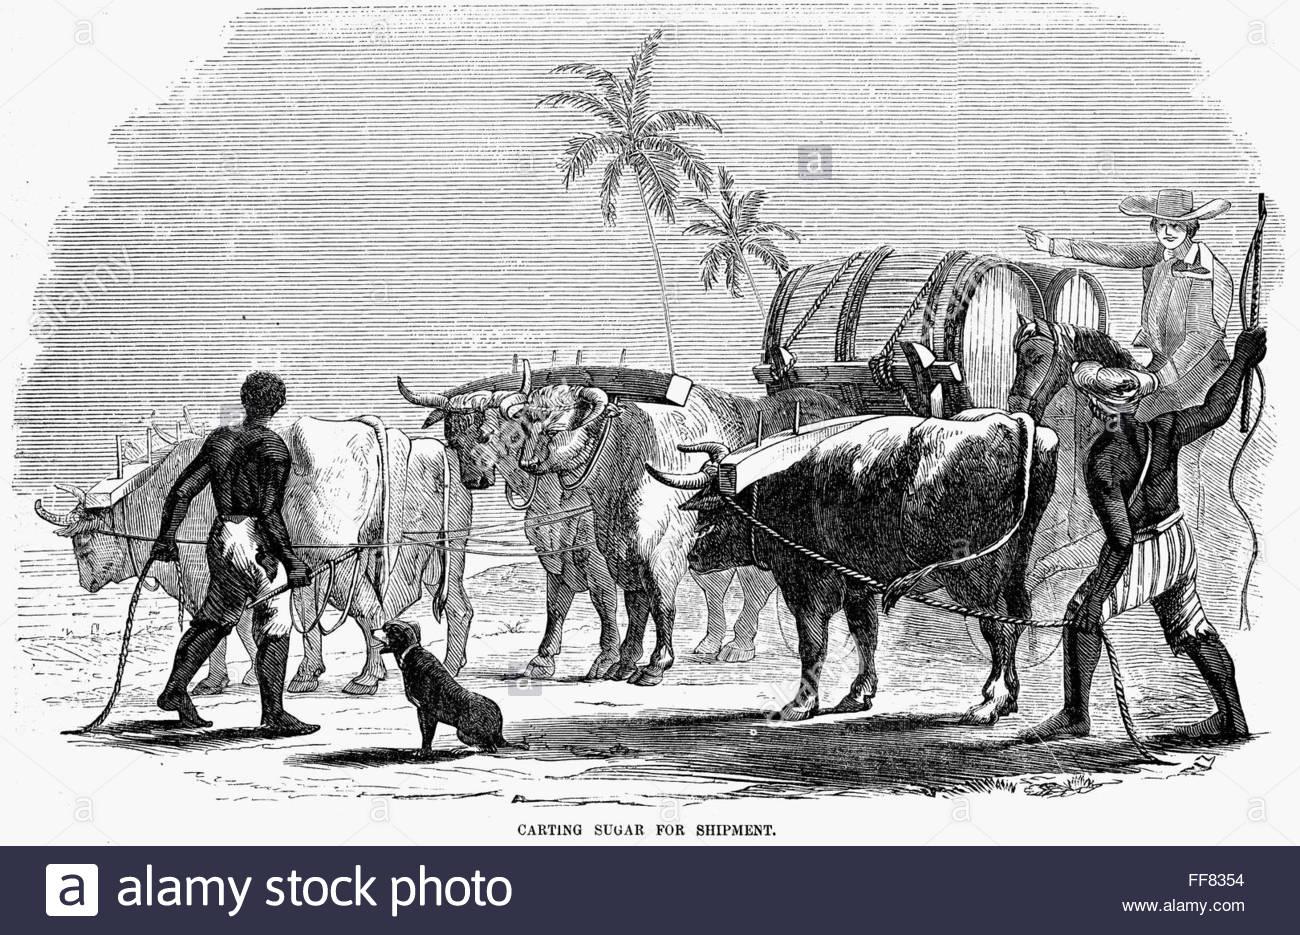 1300x935 Slavery West Indies. N'Carting Sugar For Shipment.' Slaves